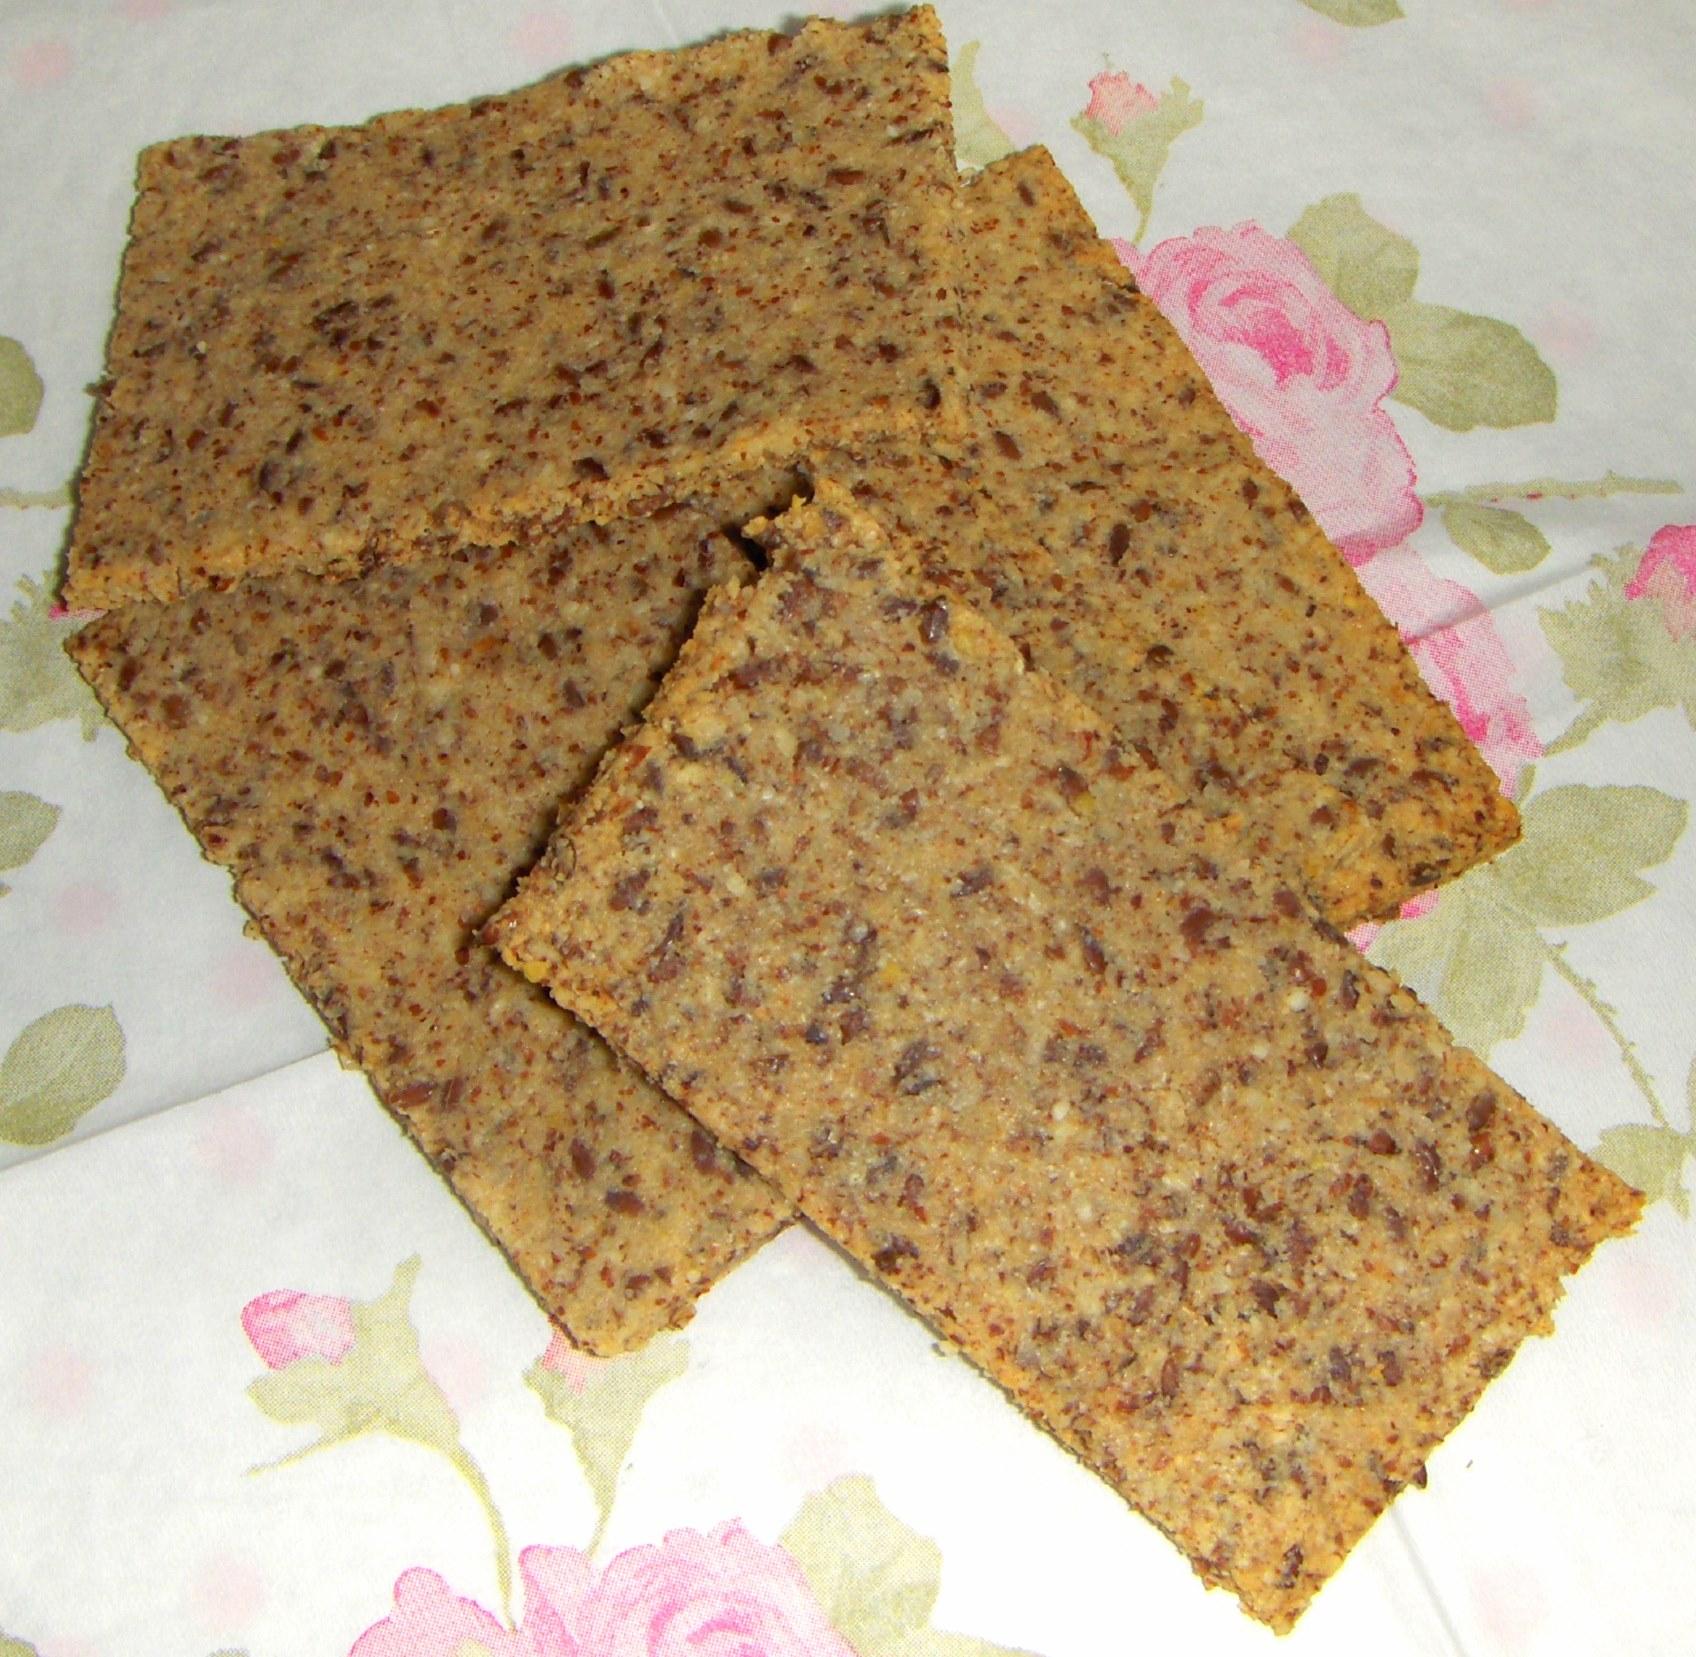 Nøddeknækbrød – duftende brød